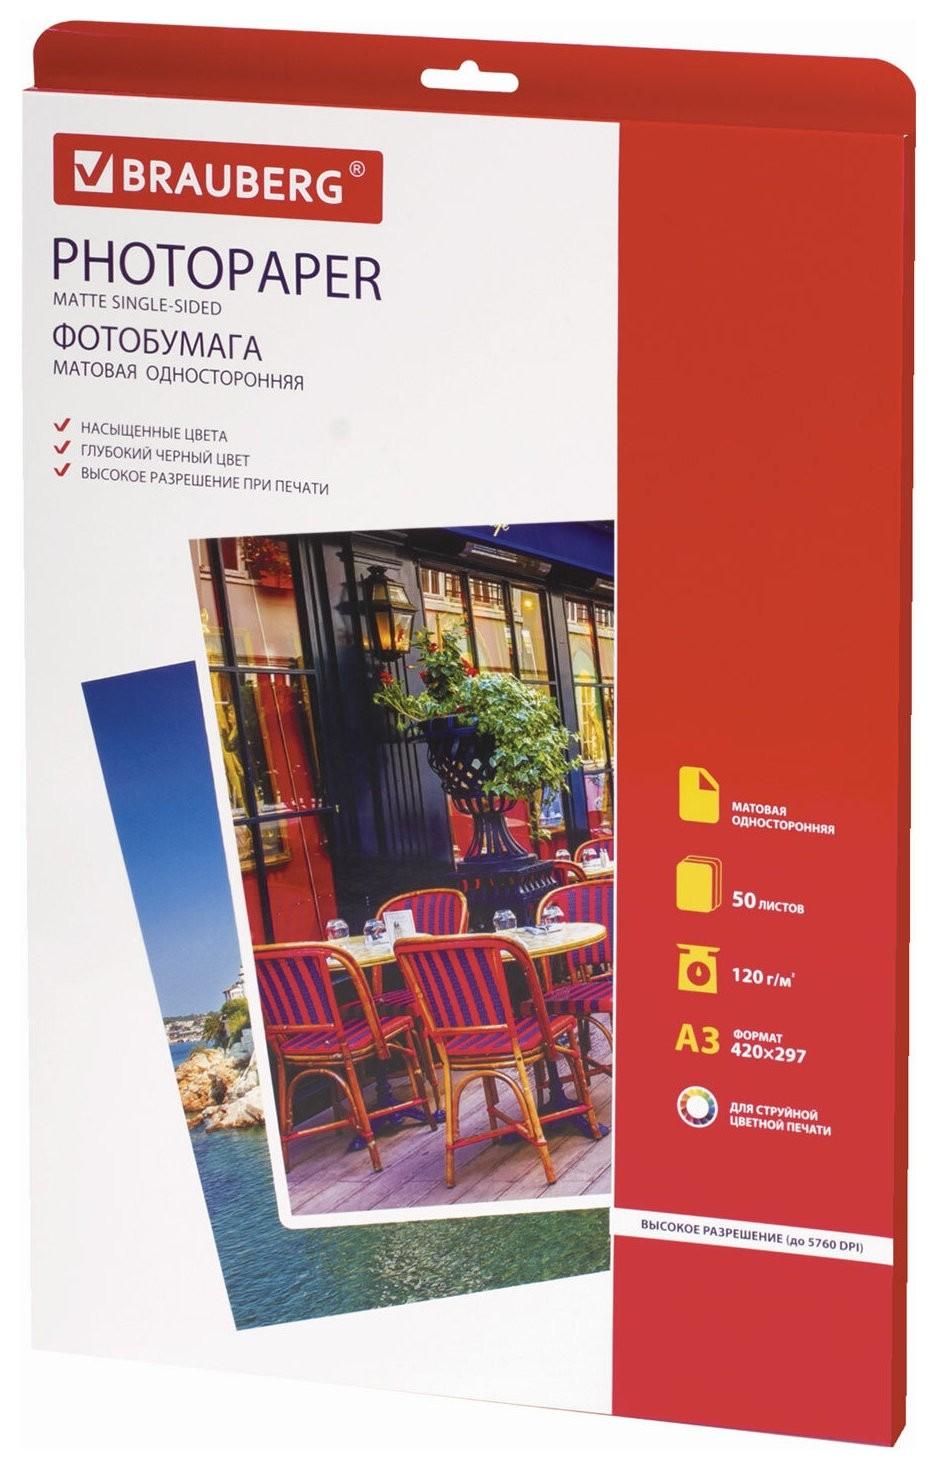 Фотобумага для струйной печати большого формата, A3, 120 г/м2, 50 л., односторонняя матовая, Brauberg, 363322  Brauberg